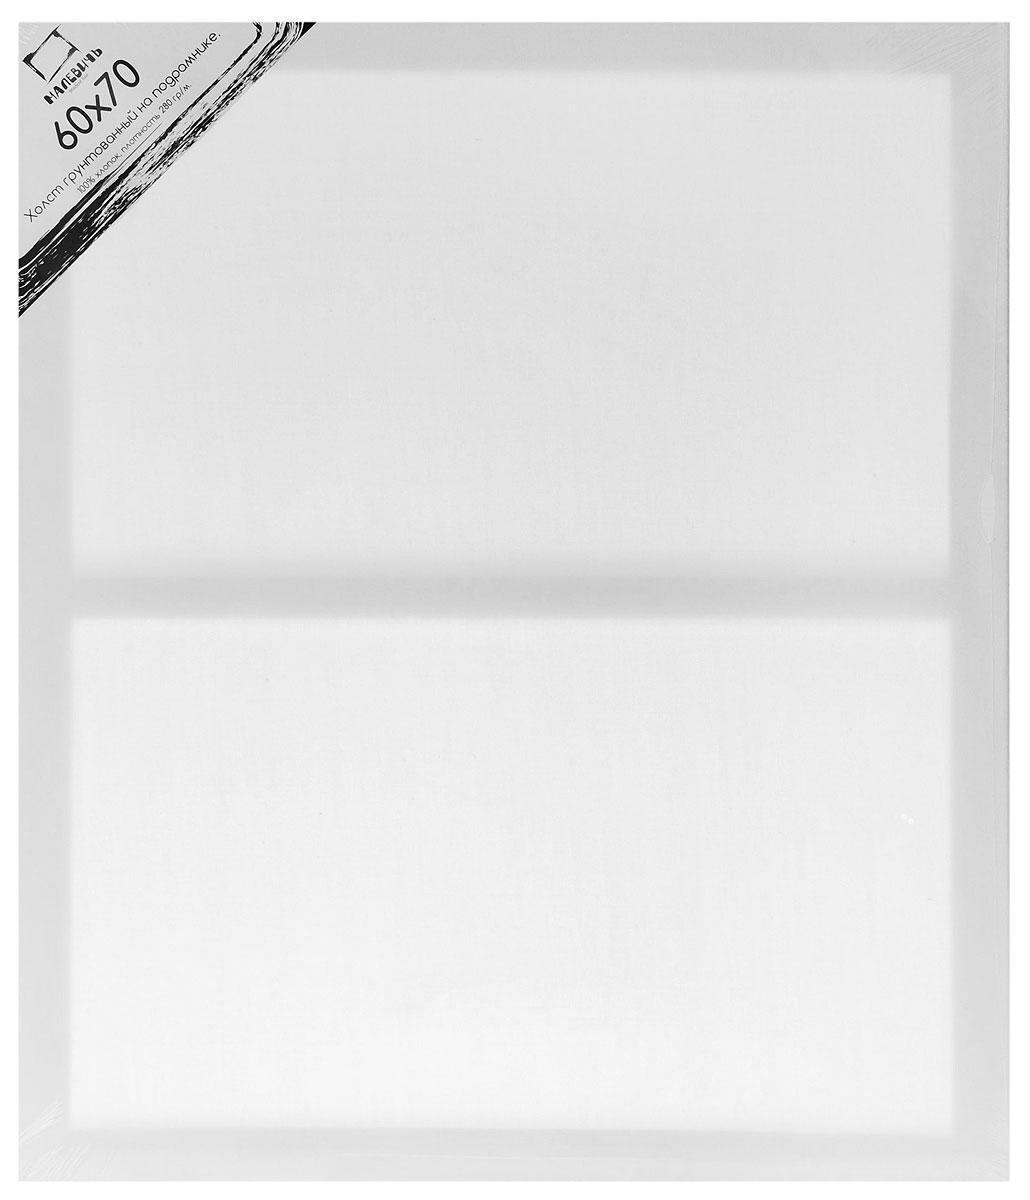 Малевичъ Холст на подрамнике 60 см x 70 см 280 г/м2